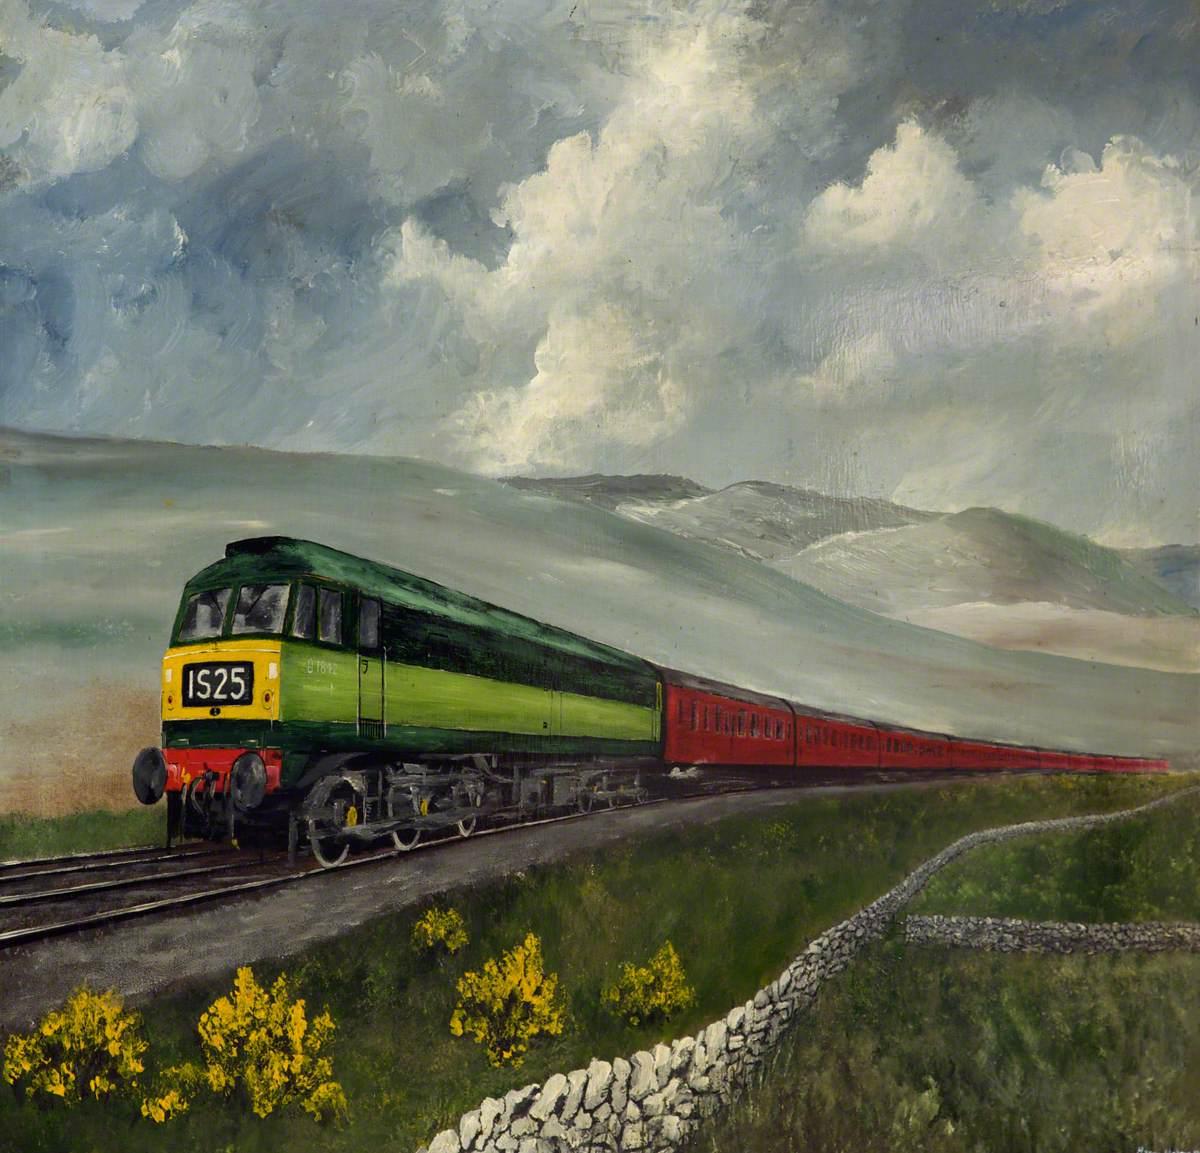 1525 Class 47 Diesel Electric